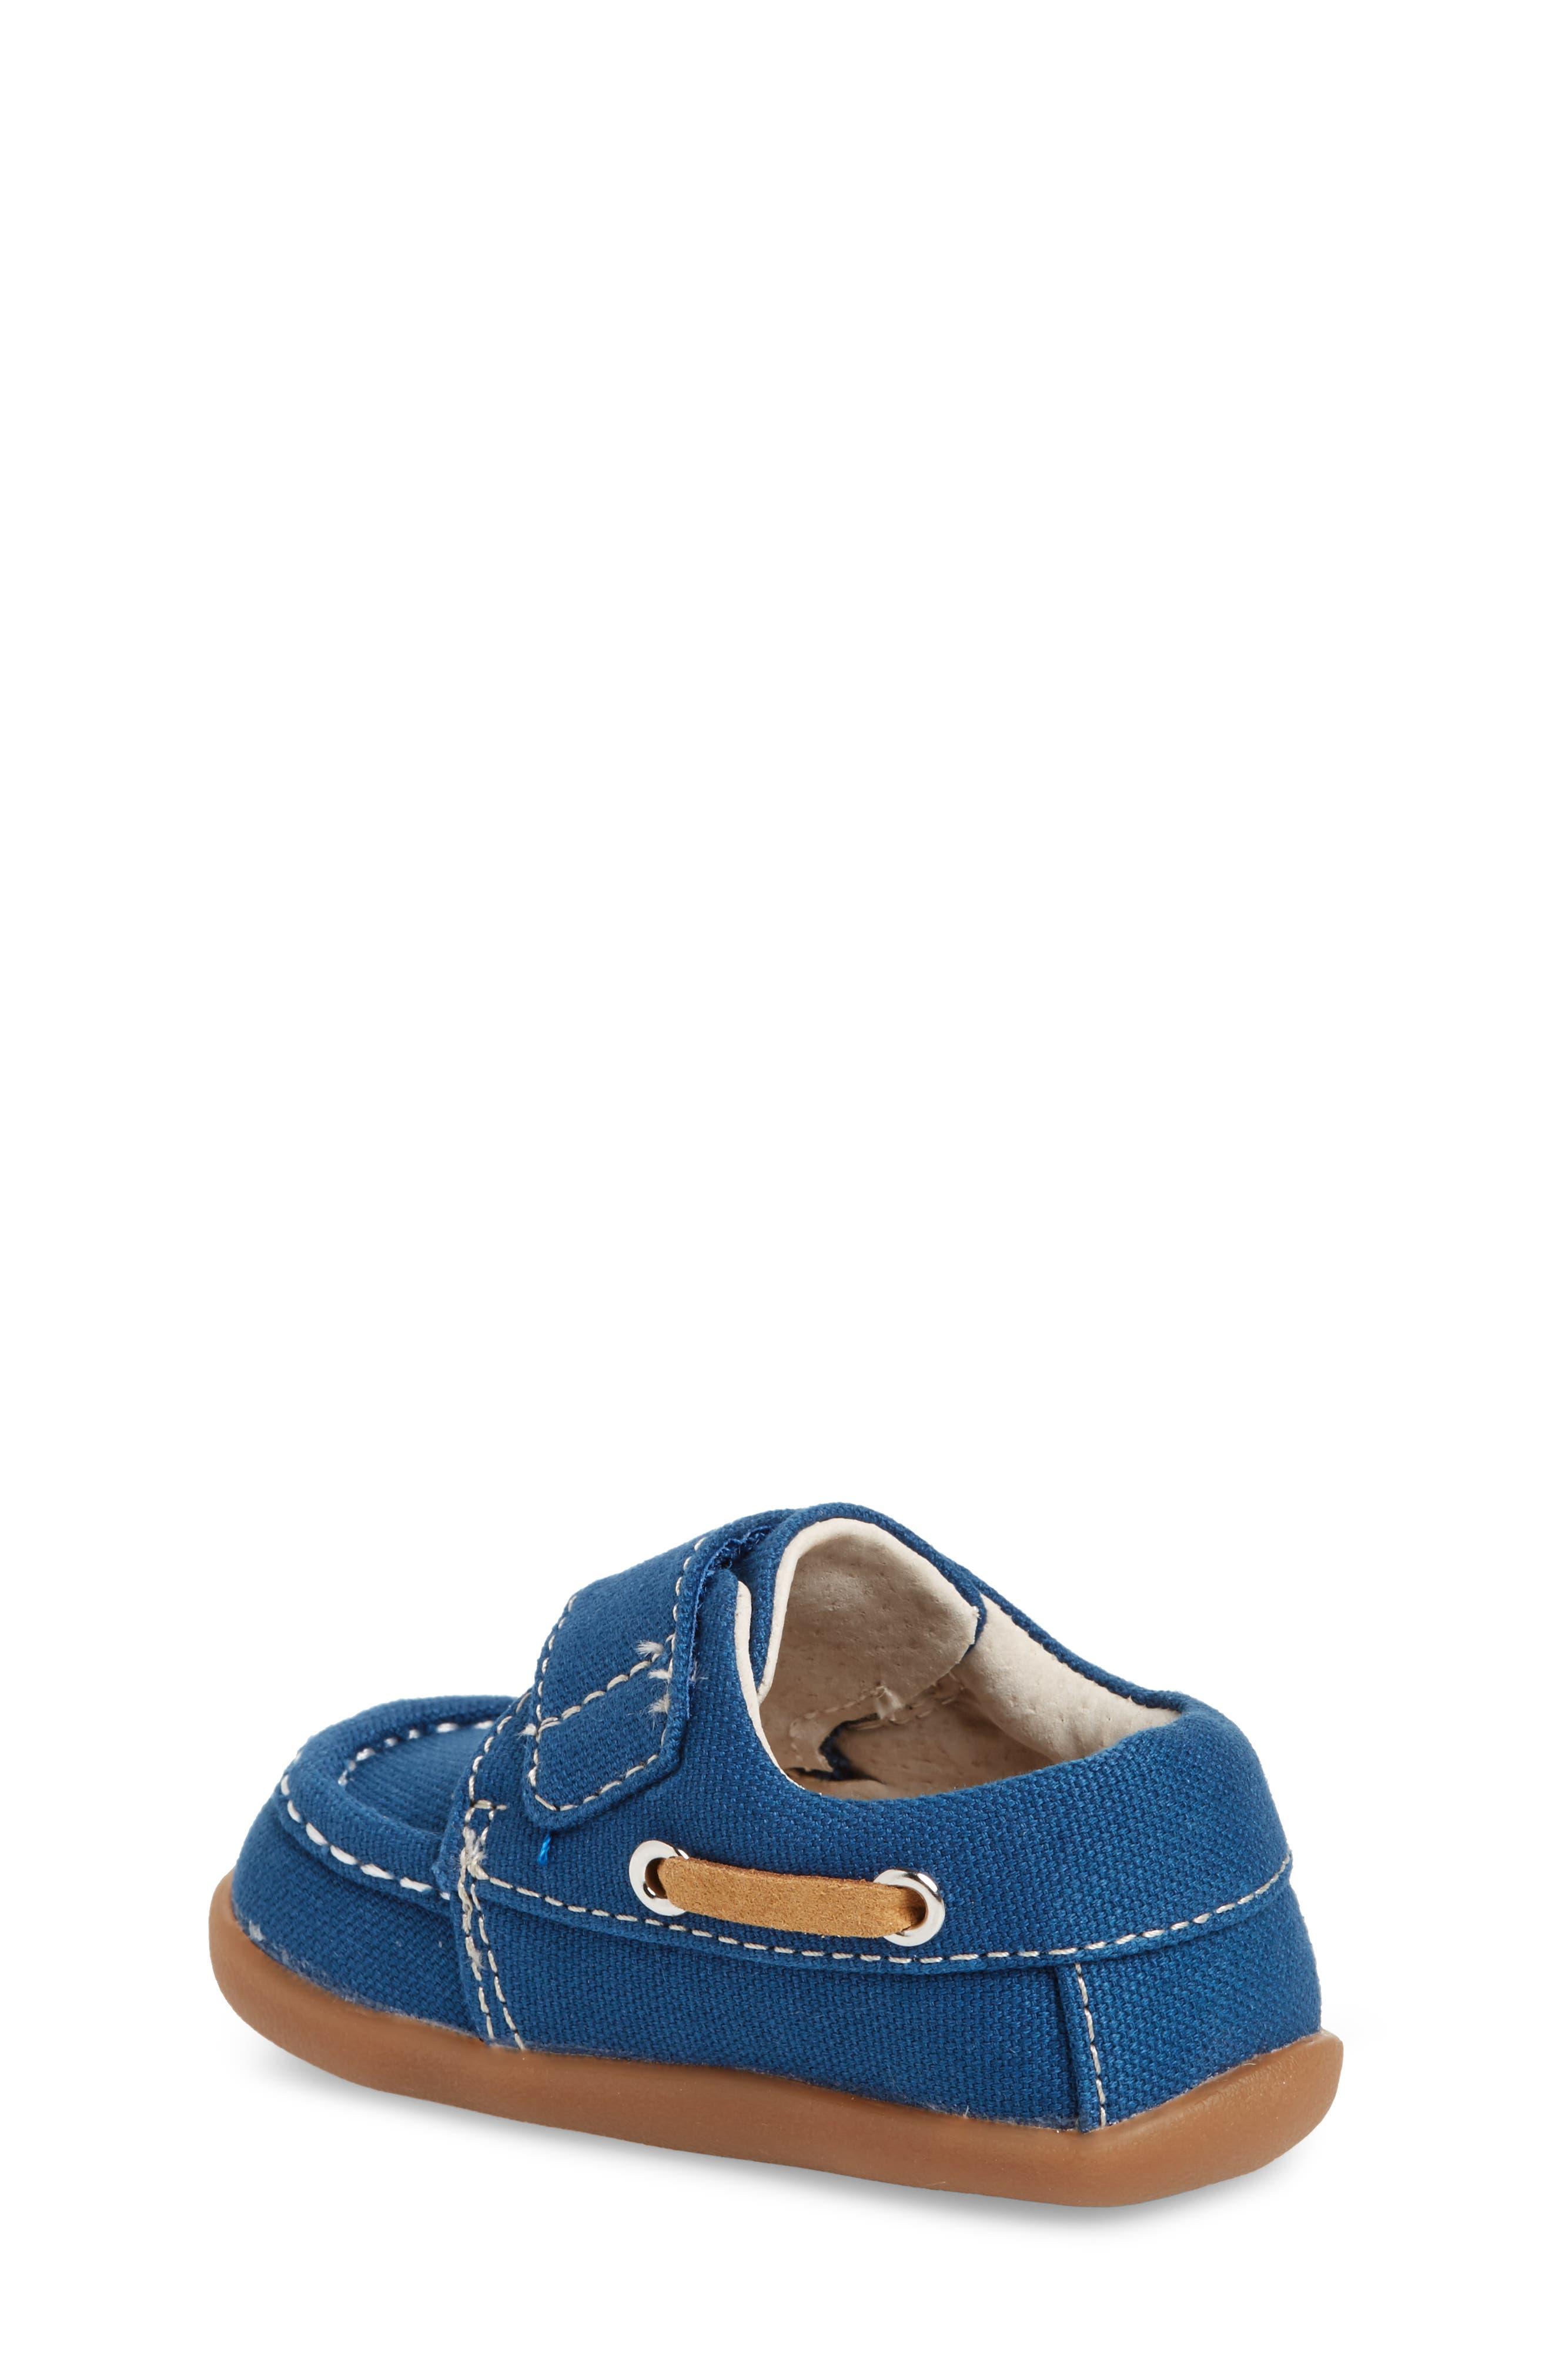 Arthur Sneaker,                             Alternate thumbnail 2, color,                             BLUE CANVAS